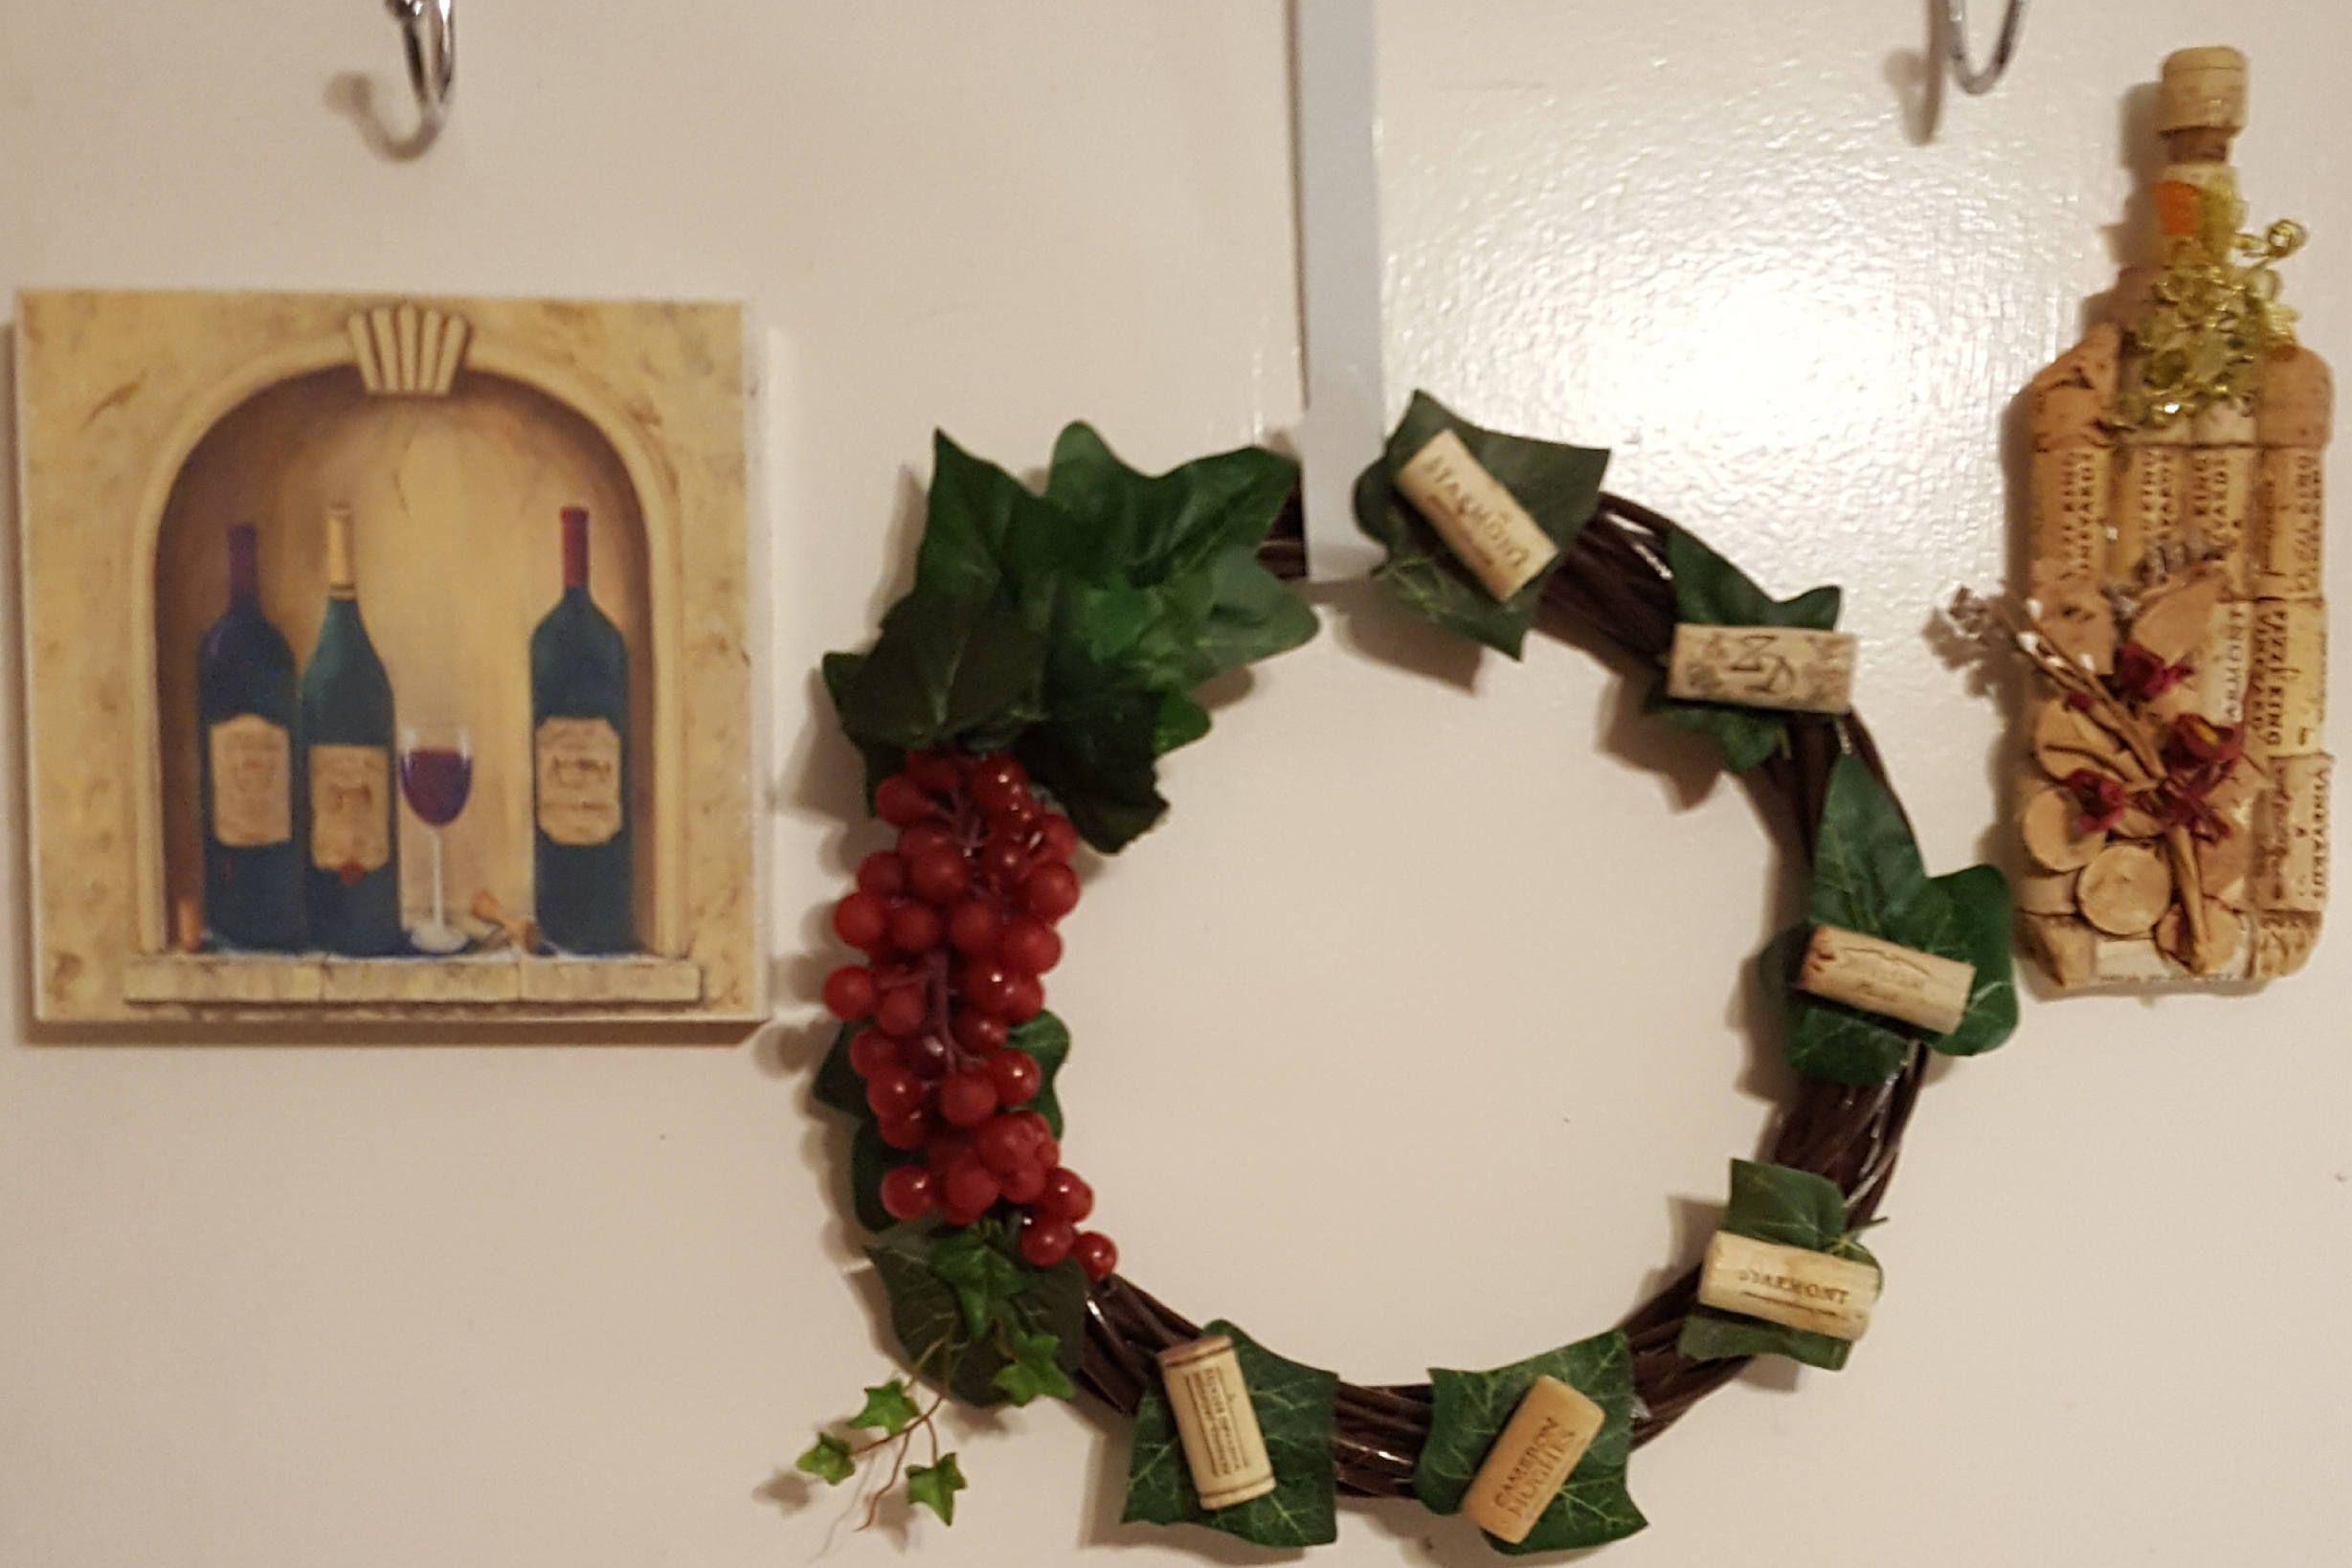 rustic wine kitchen decor set cork wine bottle grapevine grape wreath wine